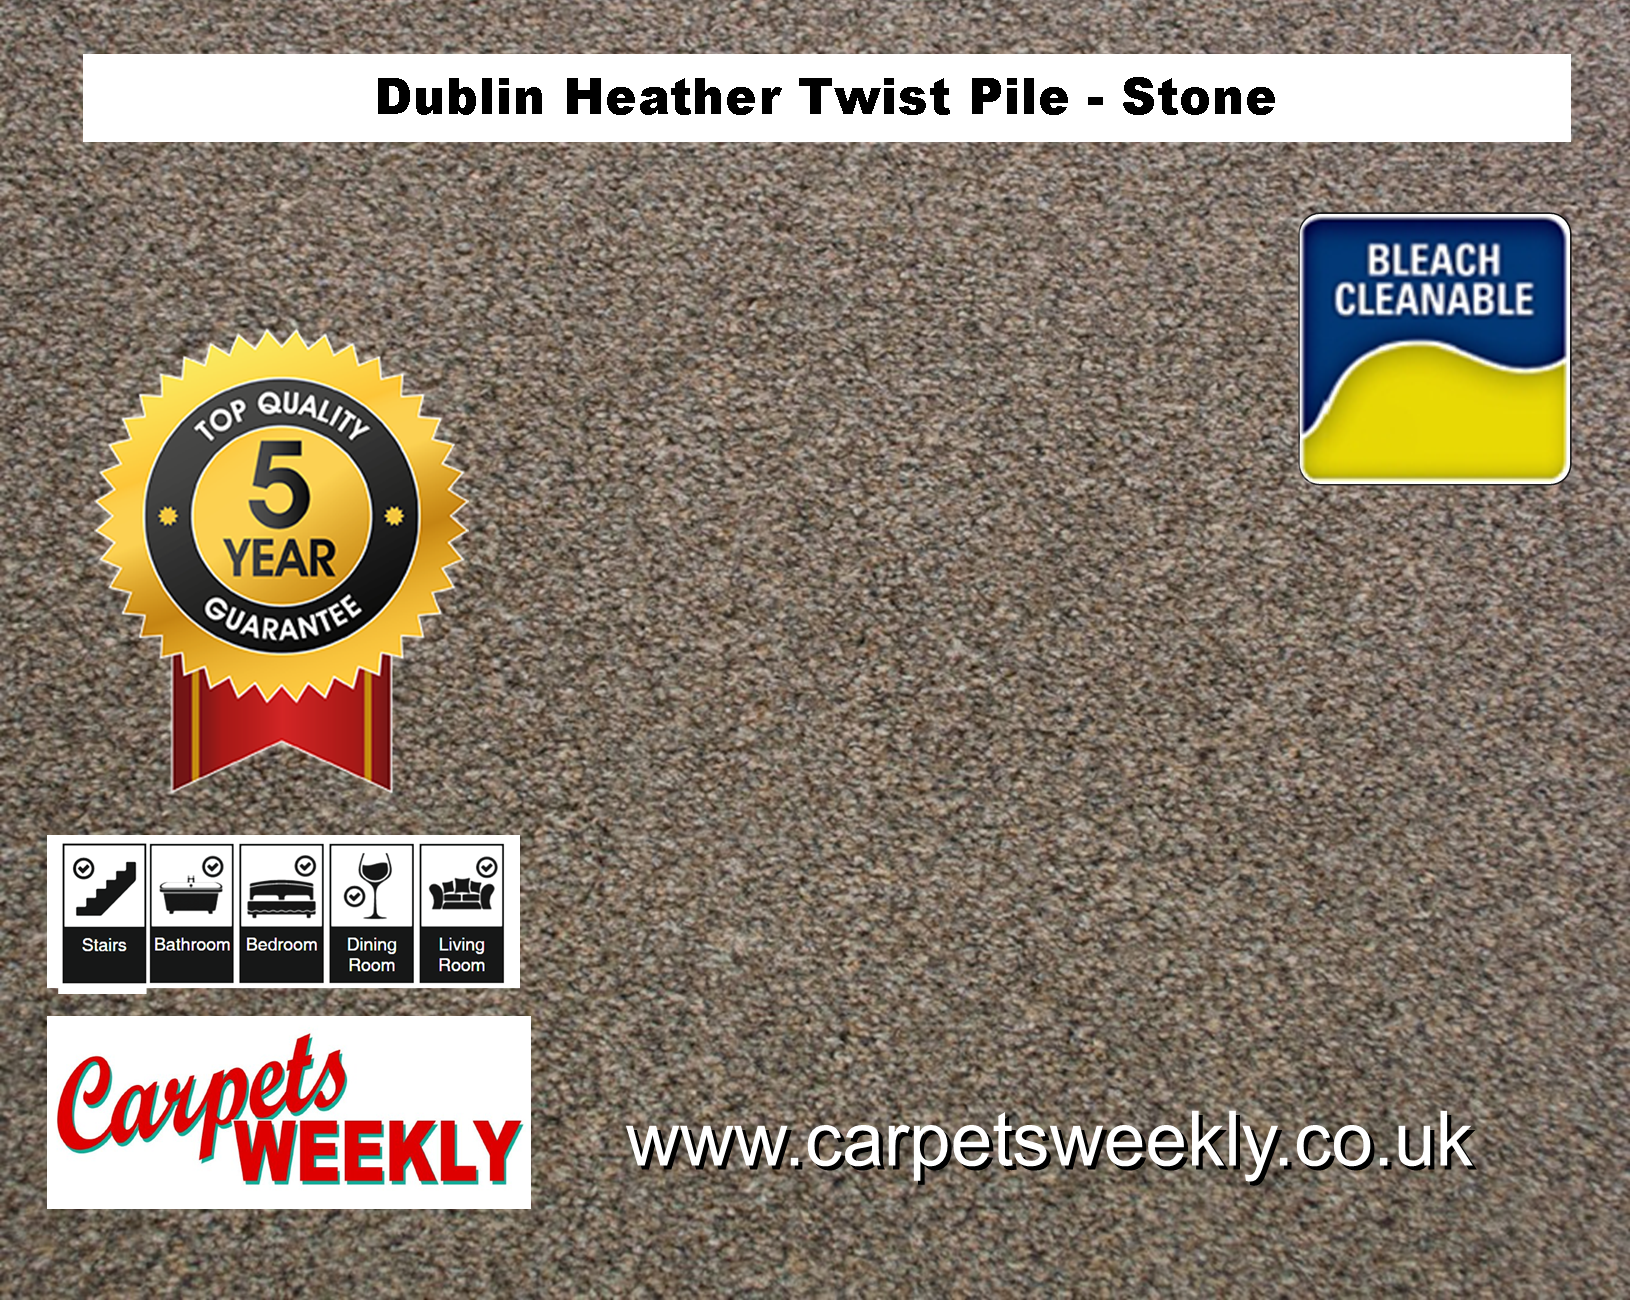 Carpets Weekly Dublin Heather Stone - 116 mid range carpet